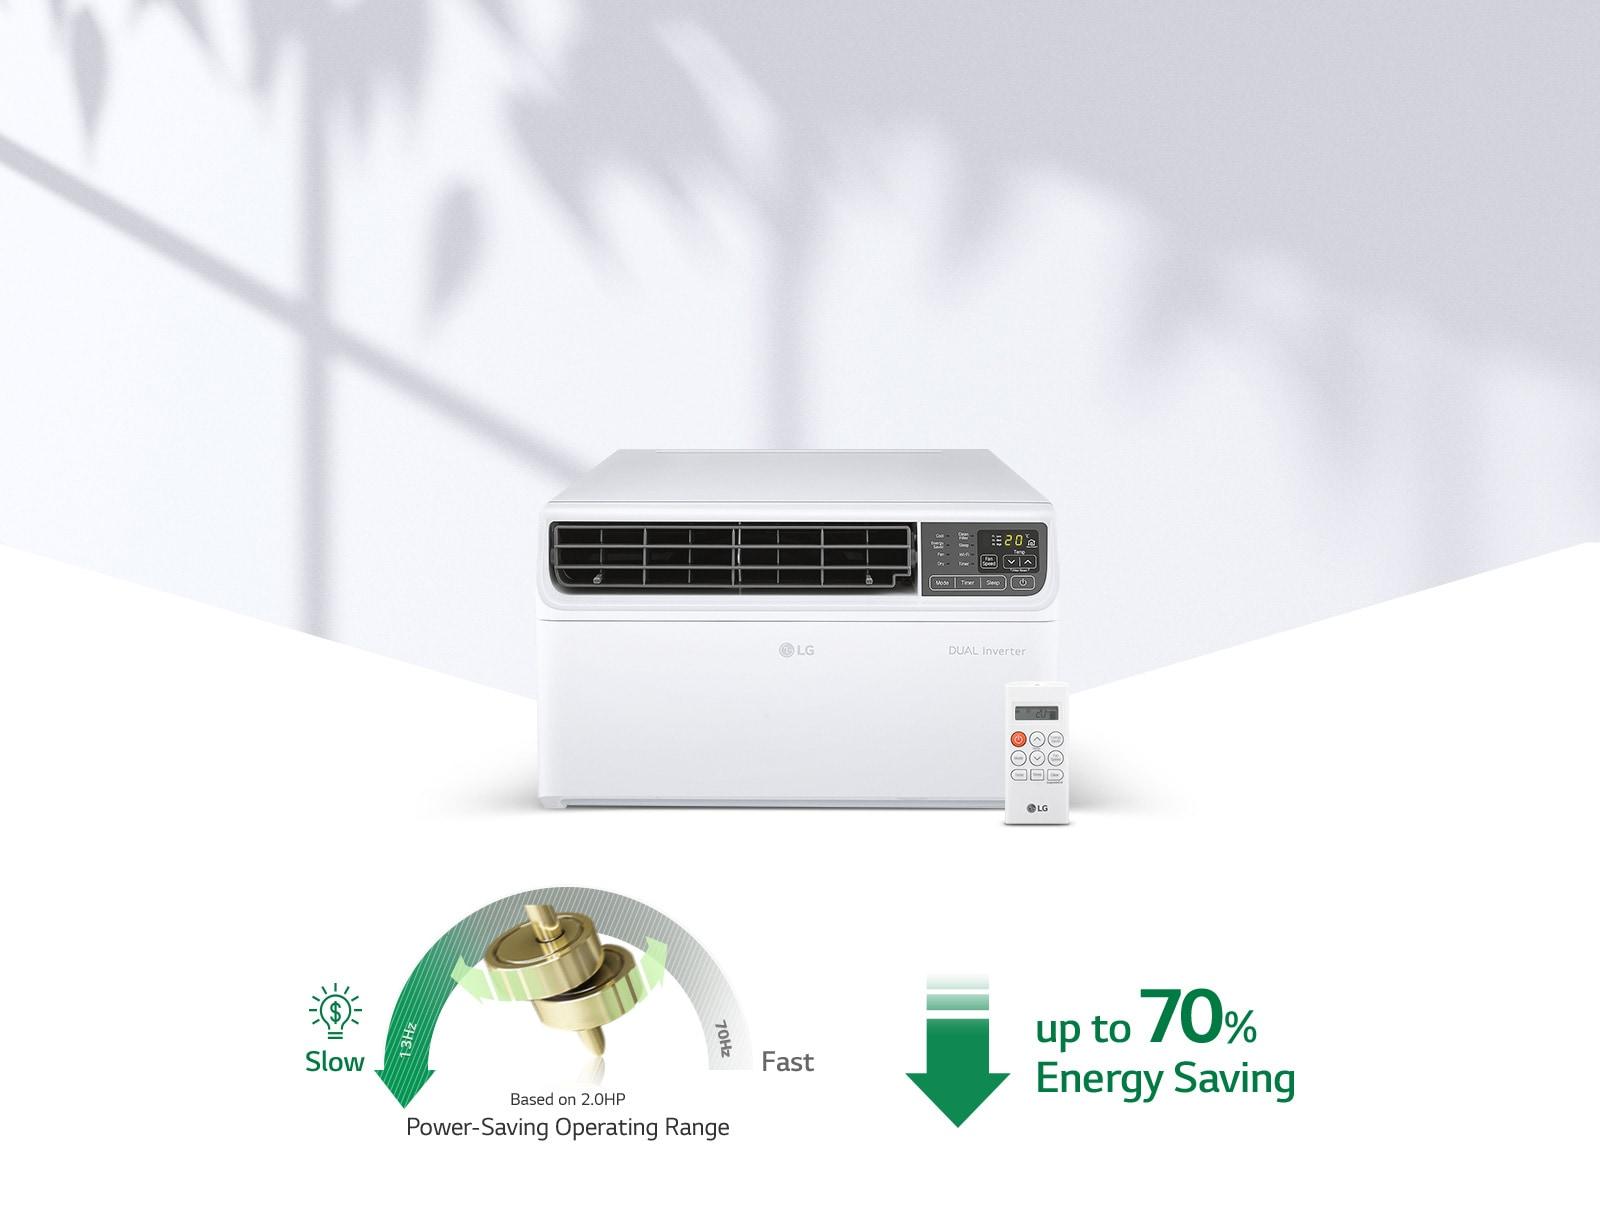 Efficient Energy Saving1